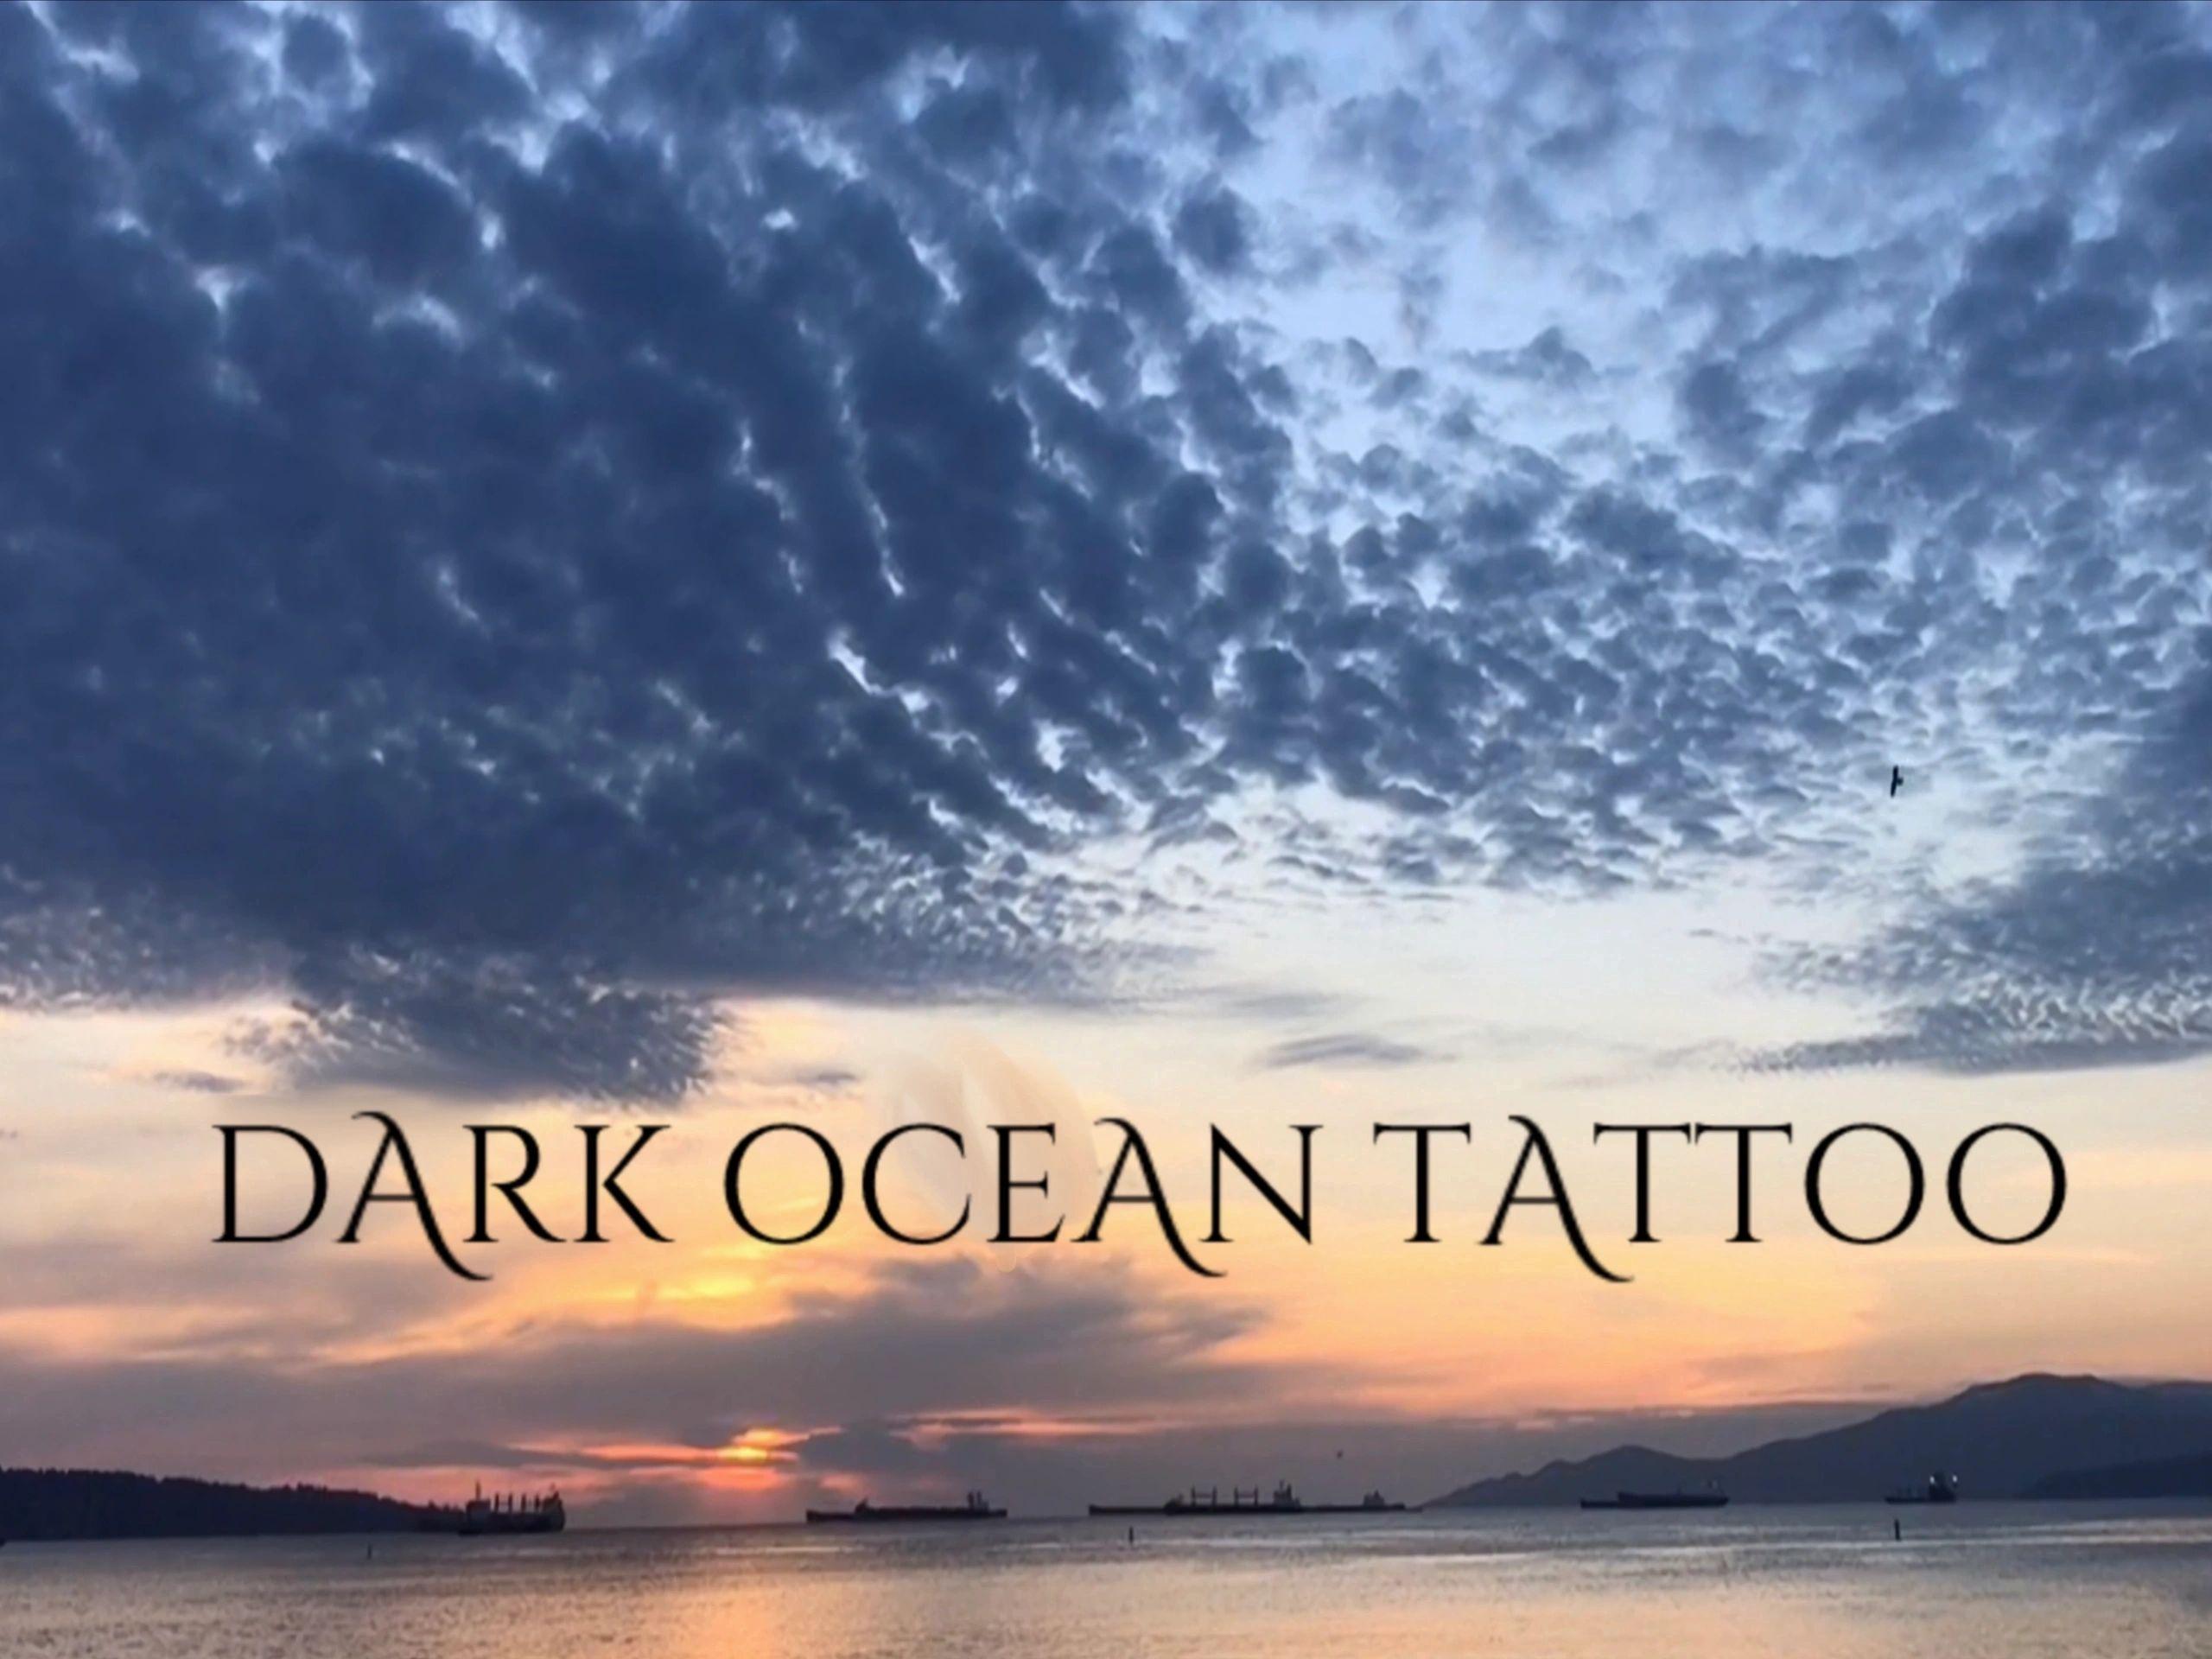 Dark Ocean Tattoo logo